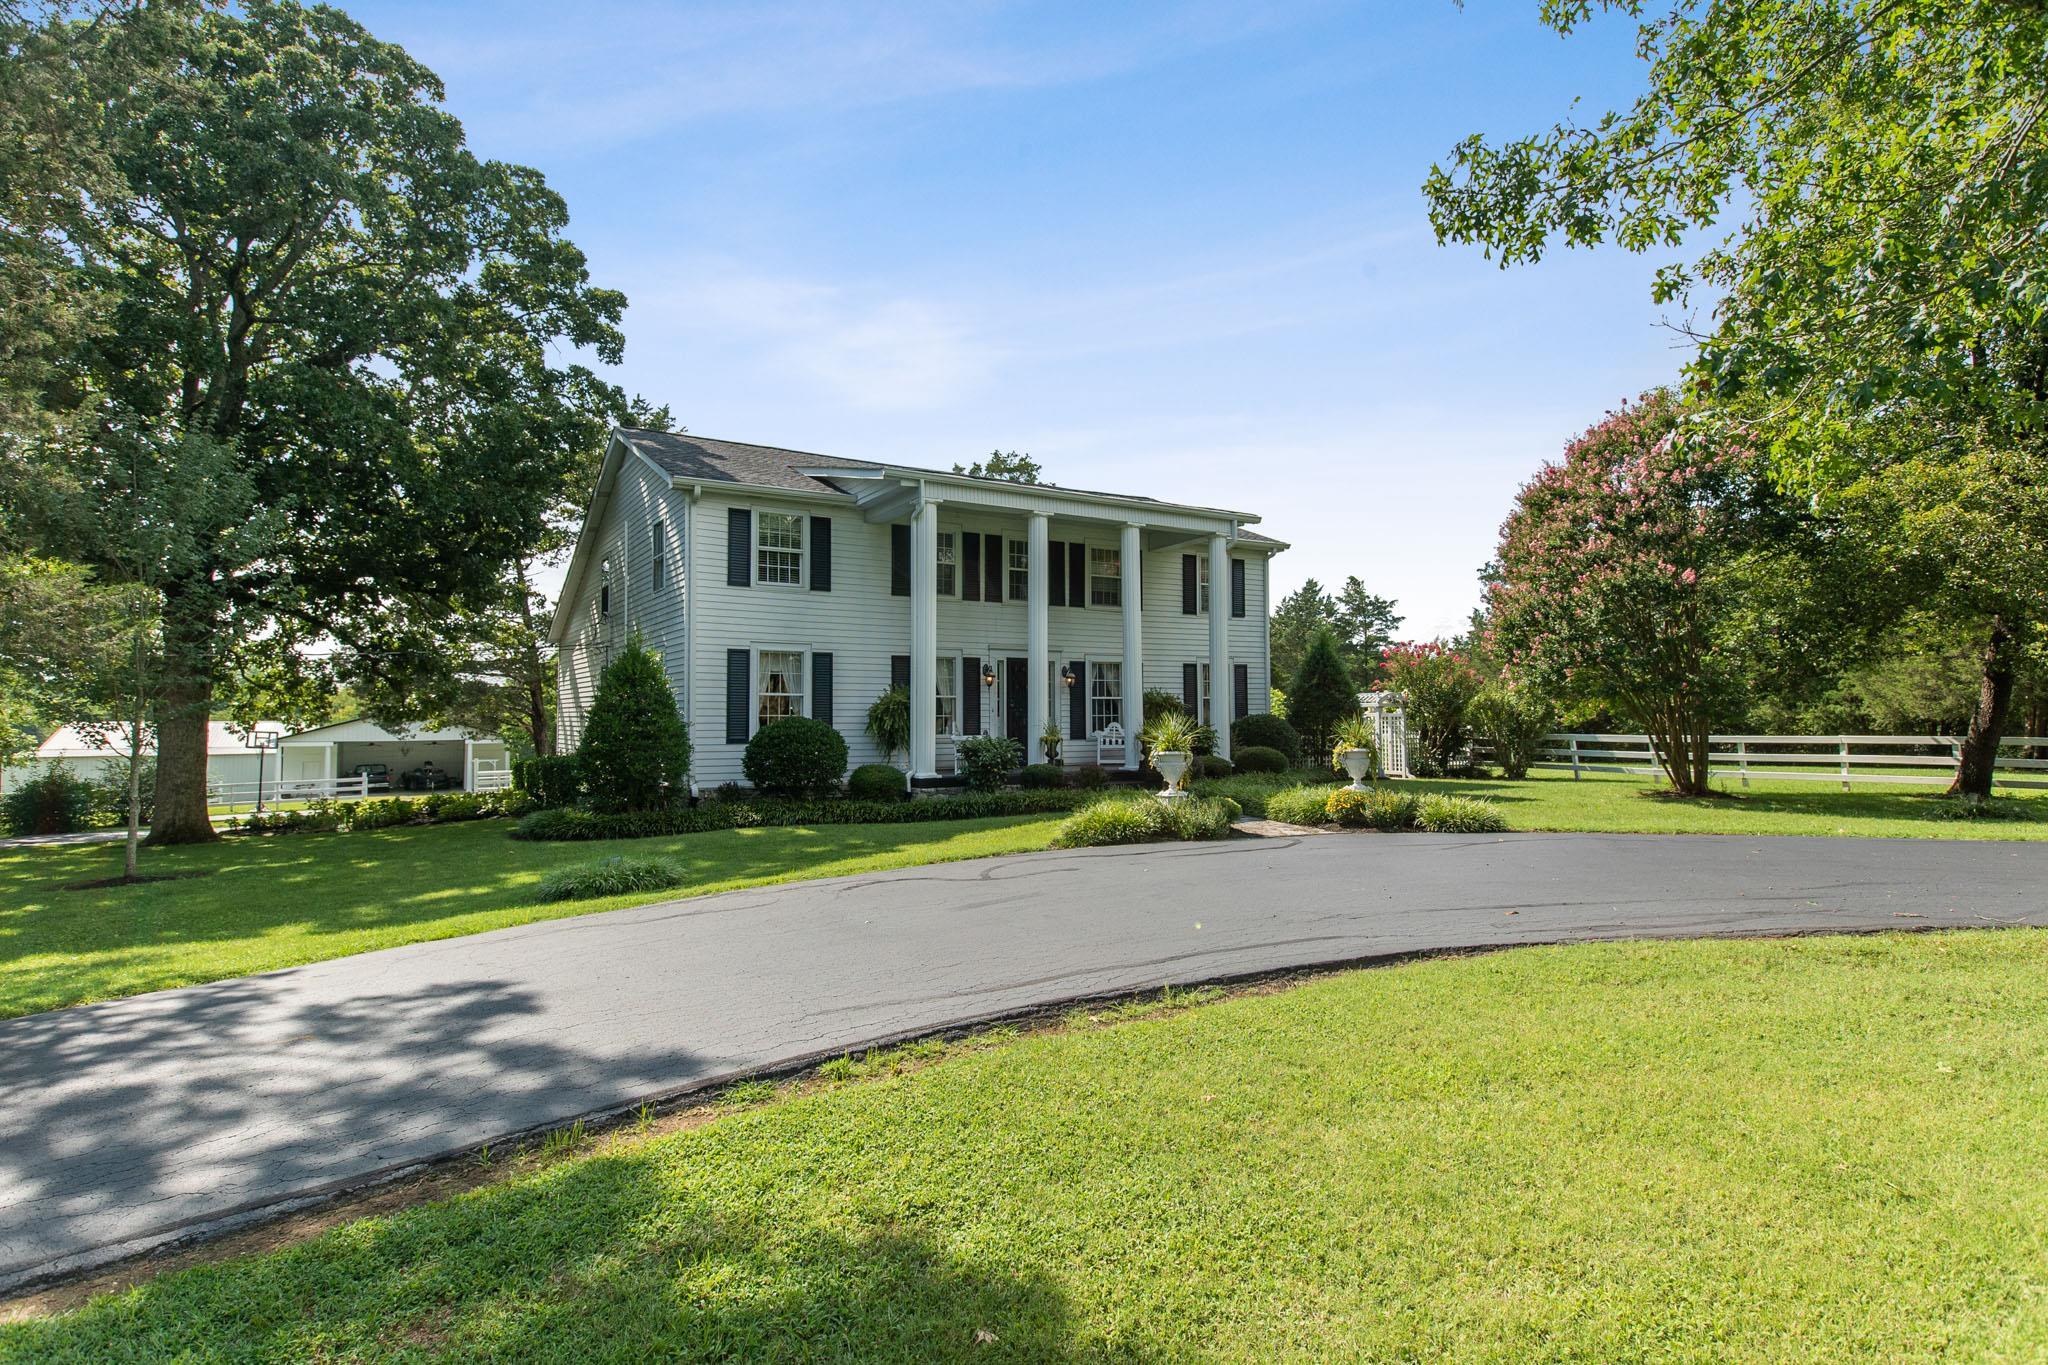 2604 Elam Rd, Murfreesboro, TN 37127 - Murfreesboro, TN real estate listing